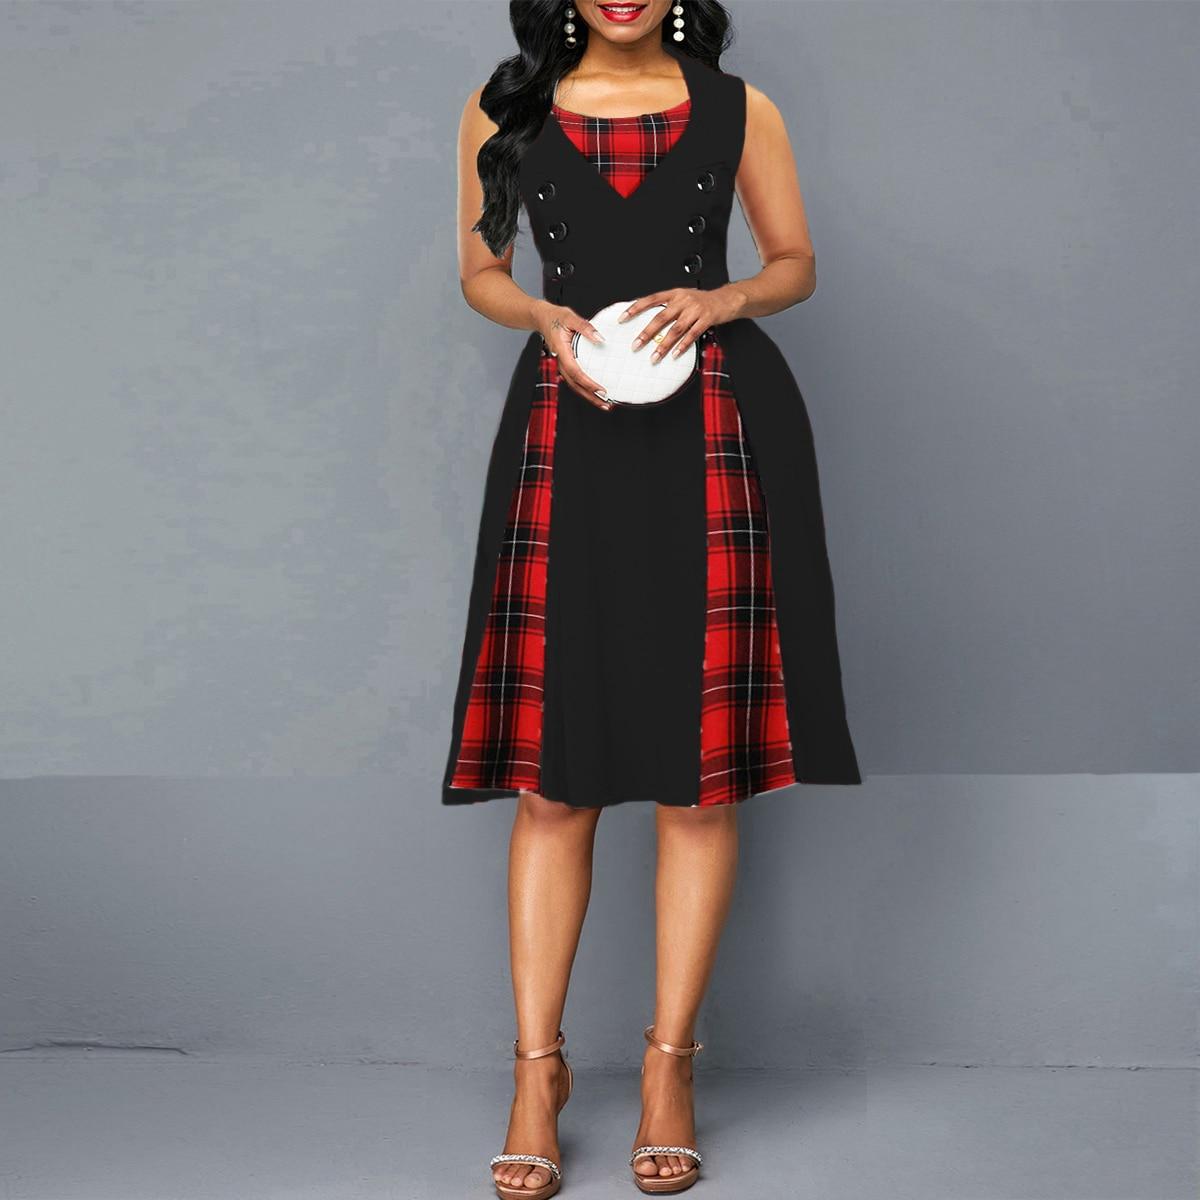 OTEN 2020 Women size big tartan dress Summer Tunics Vintage Sleeveless Red Plaid Print Button Rockabilly party sexy Pin up dress